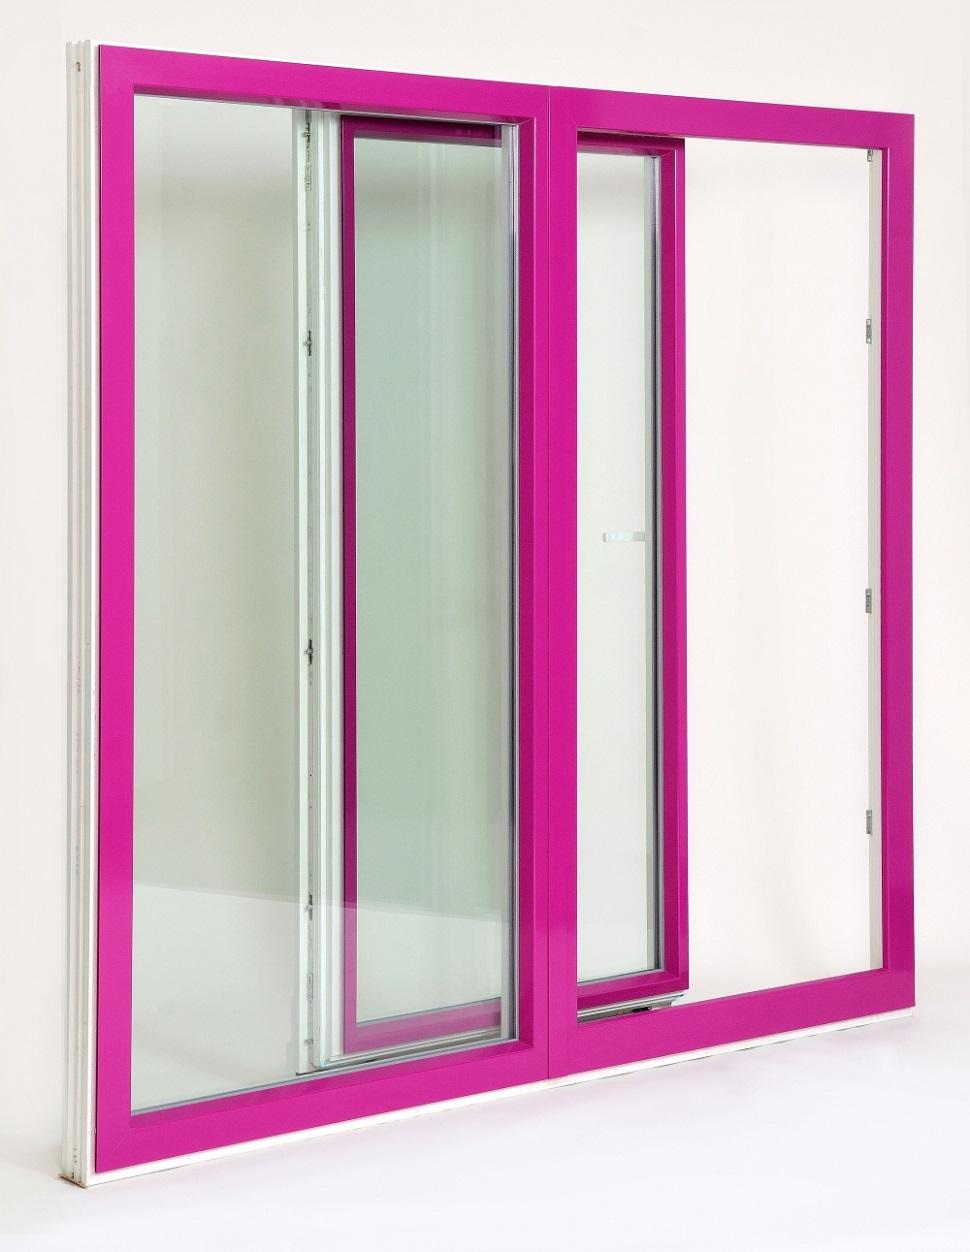 پنجره فولکس واگنی